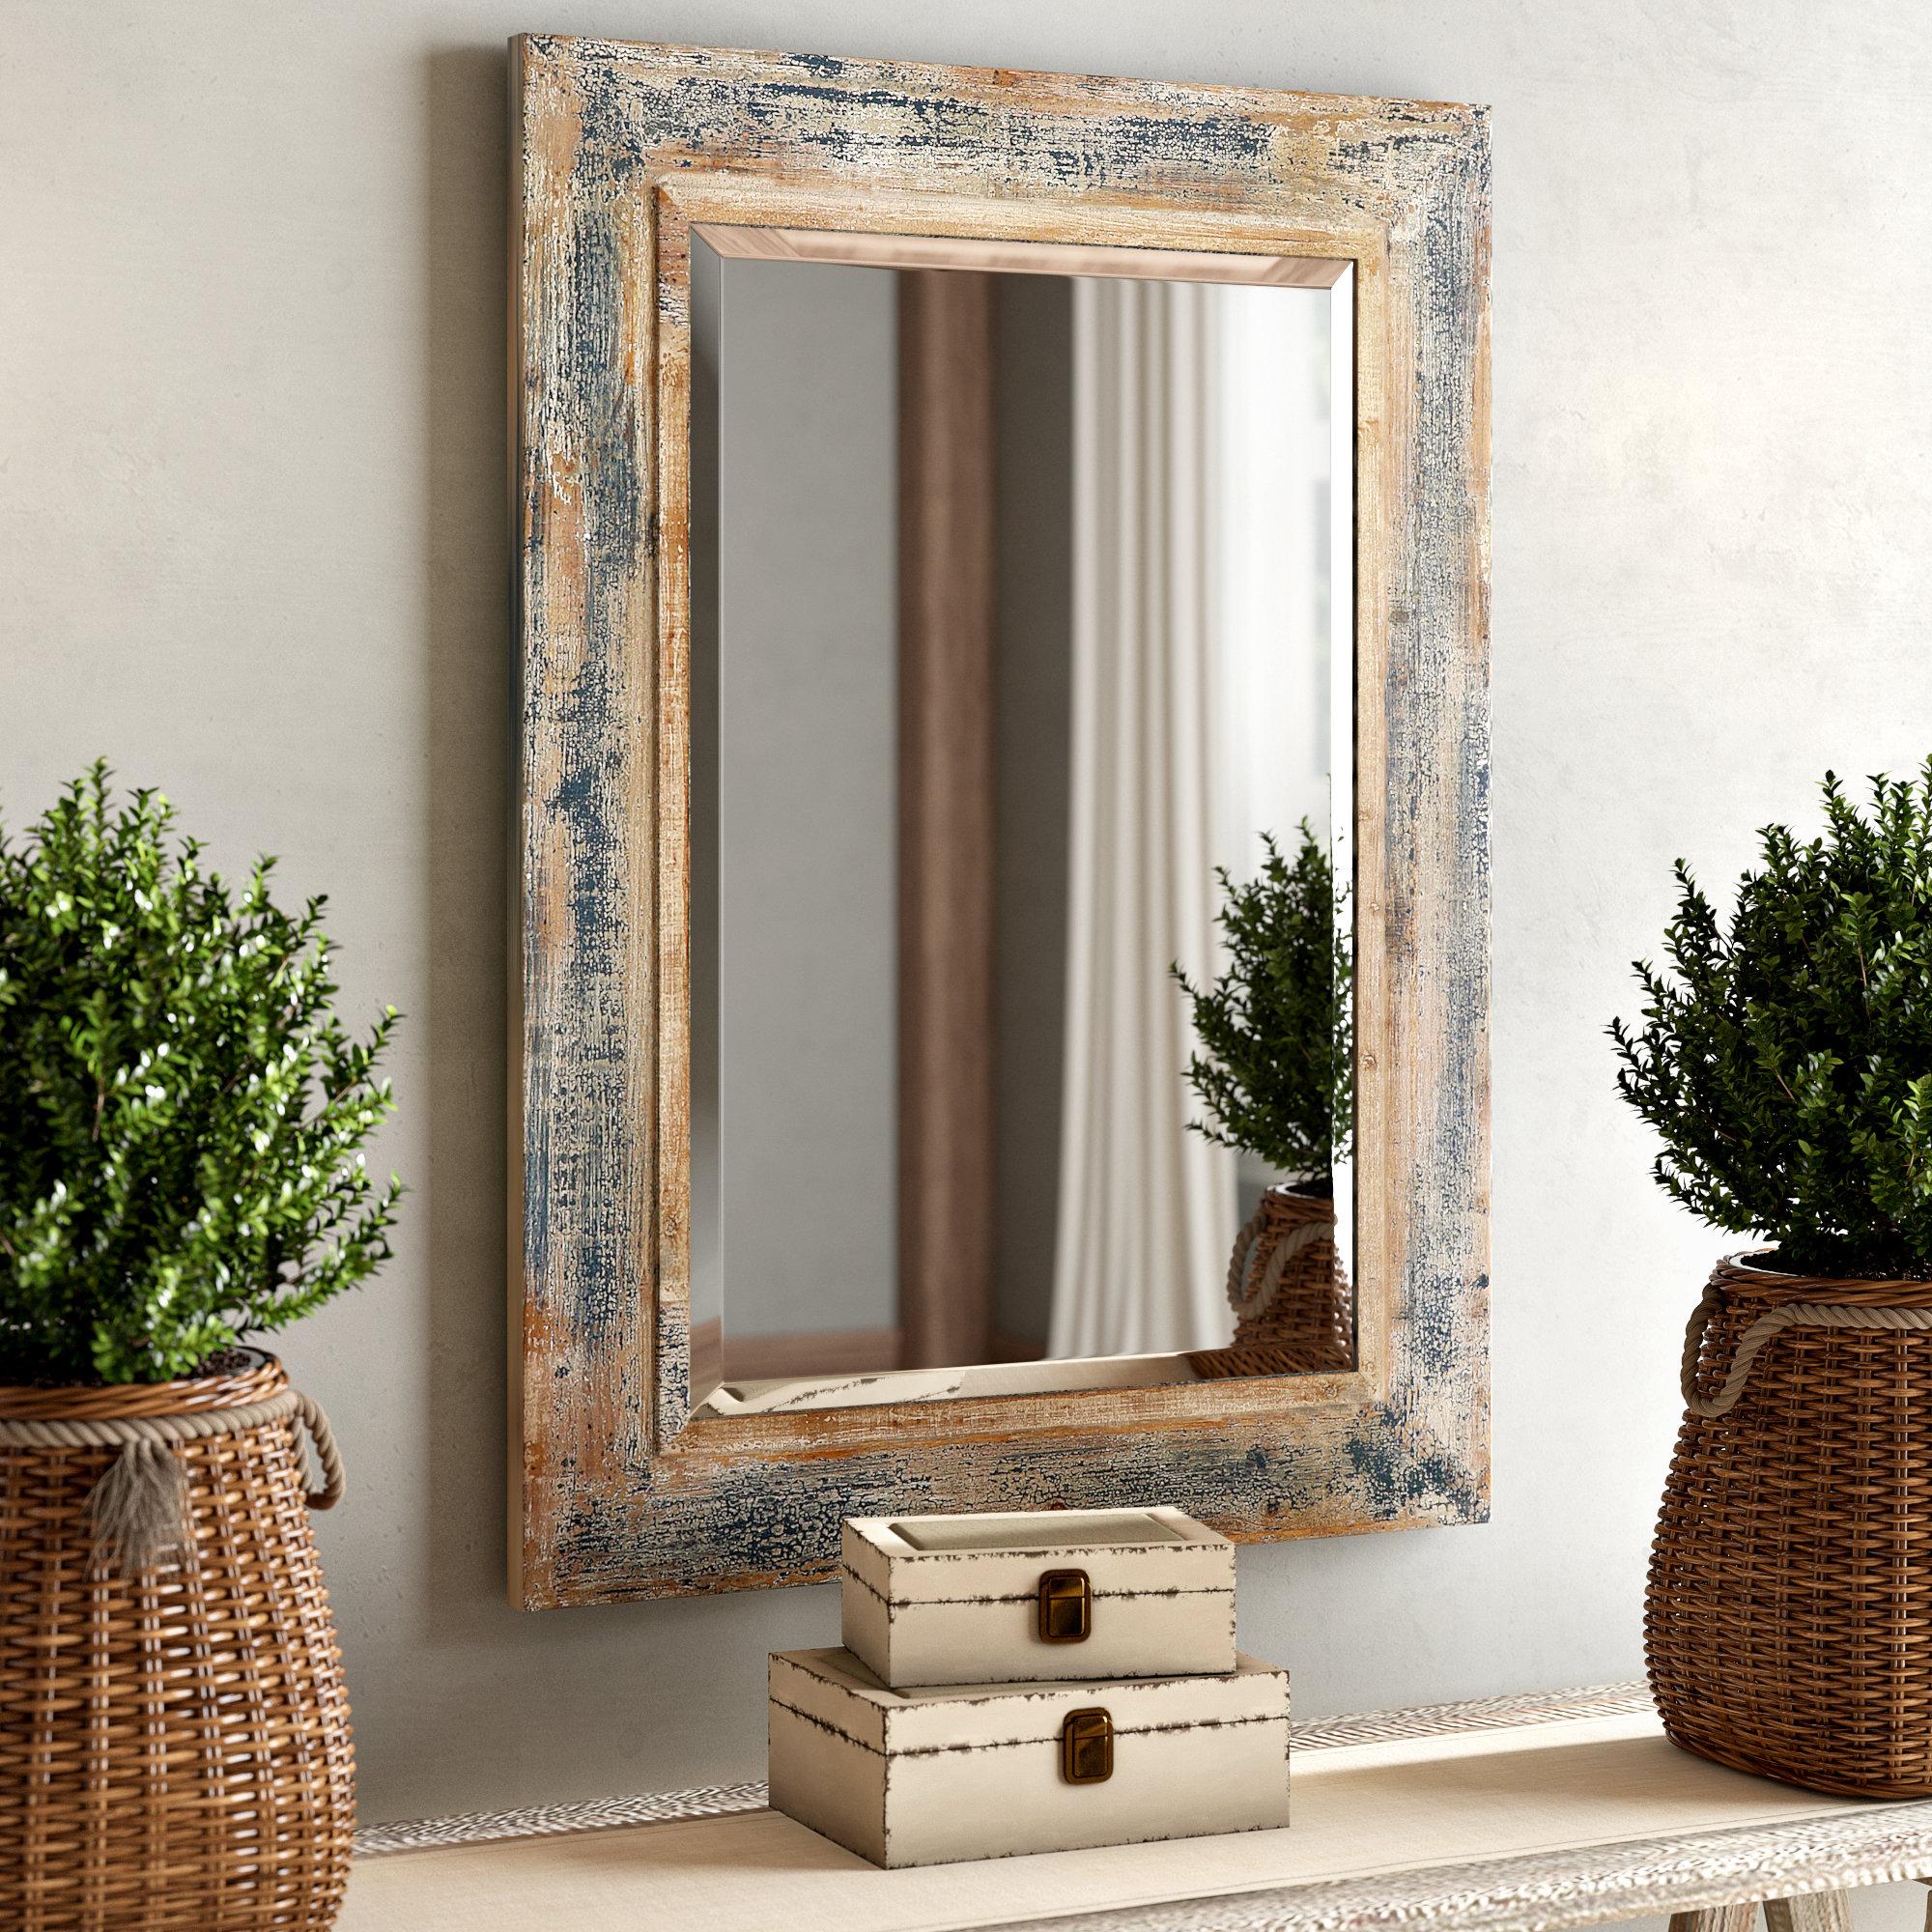 Geometric Wall Mirror | Wayfair Inside Rectangle Ornate Geometric Wall Mirrors (View 12 of 20)